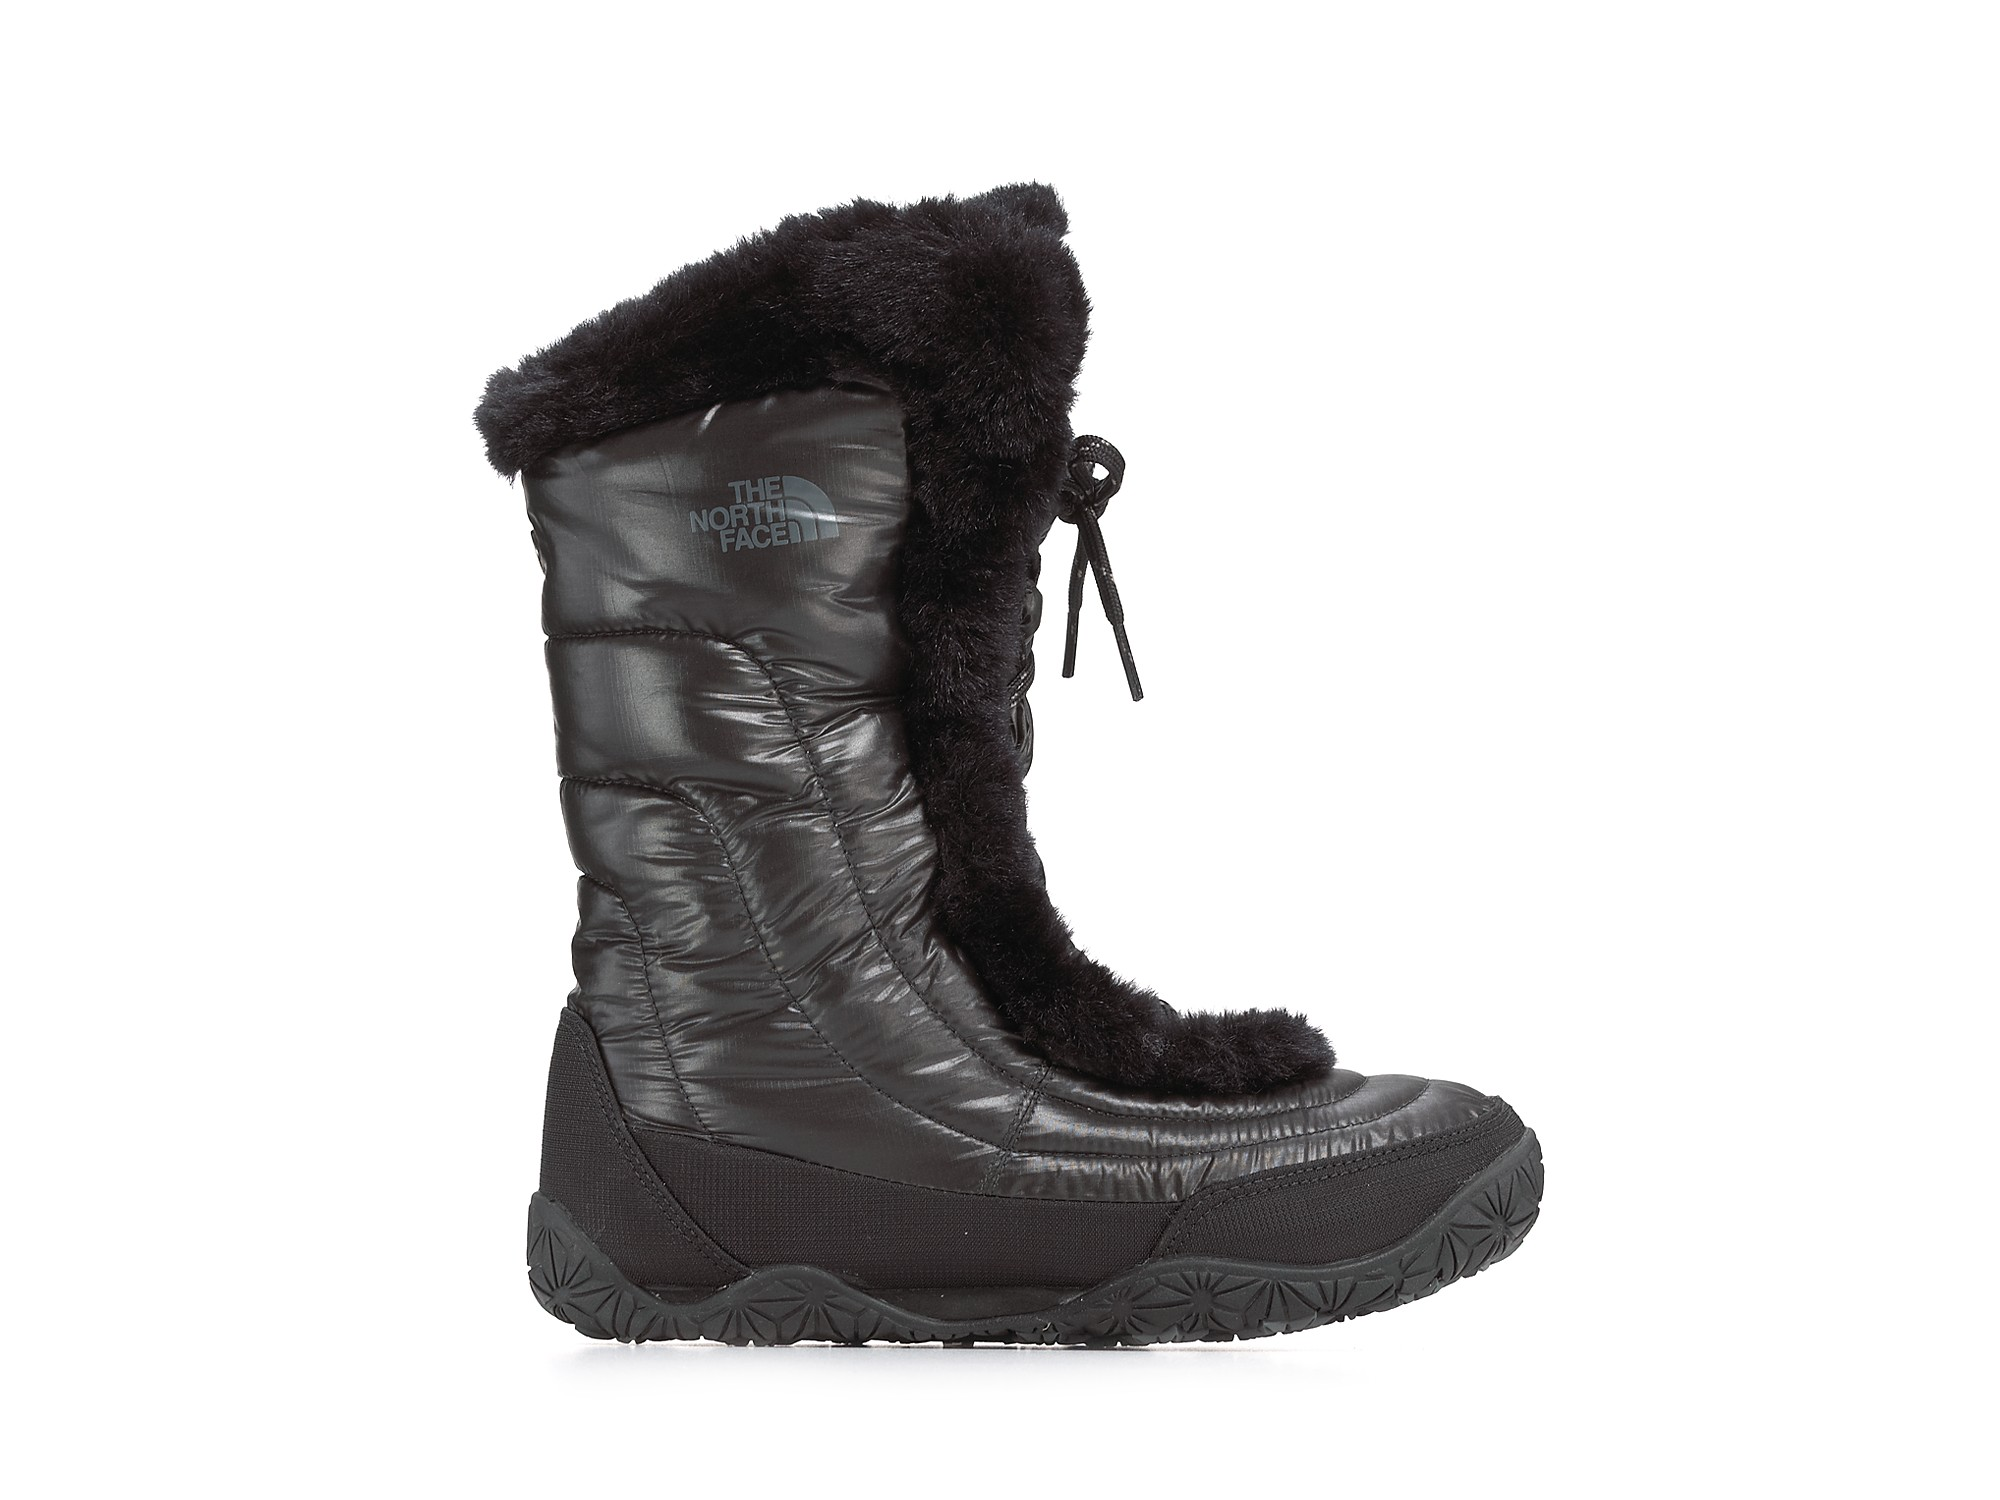 North Face Iii Nuptse Boots  4abf5706f